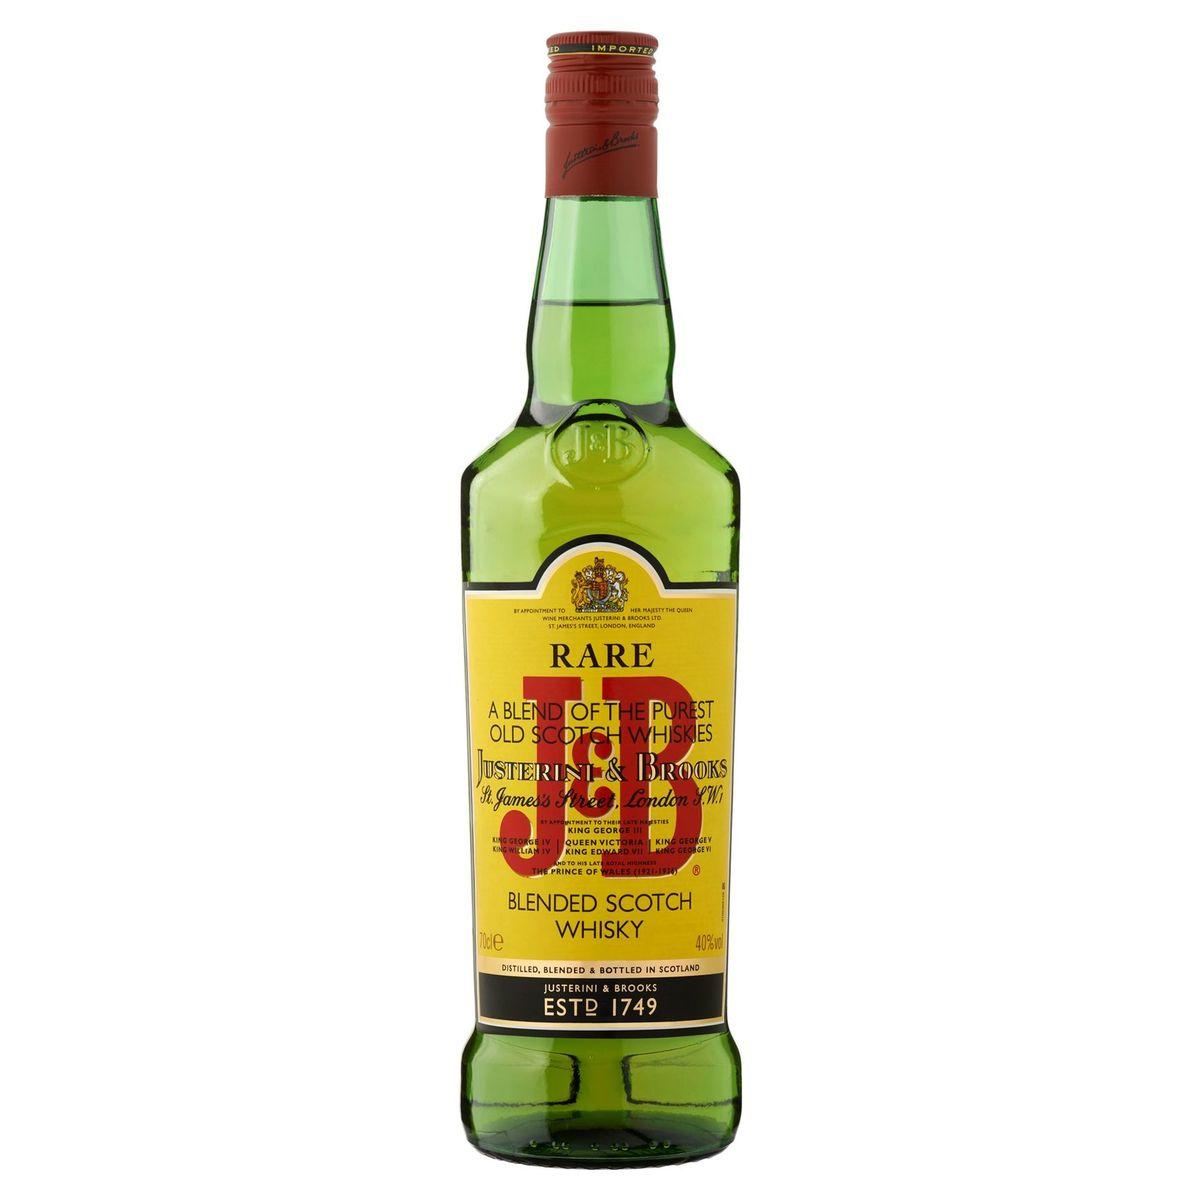 J&B Rare Blended Scotch Whisky 70 cl